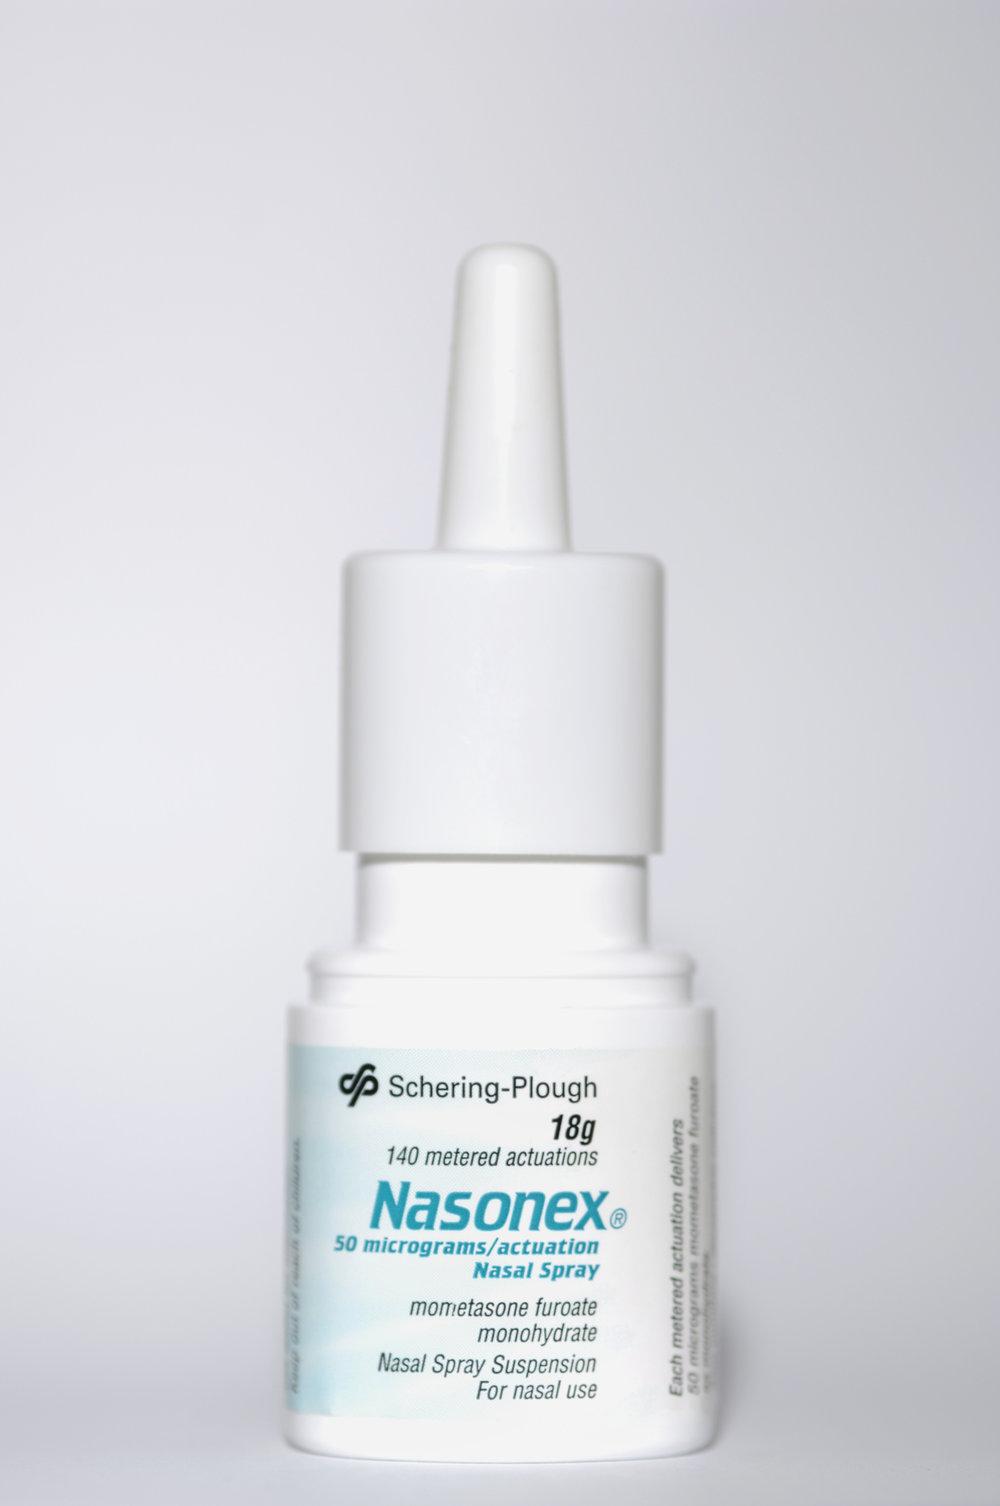 mometasone (nasal)